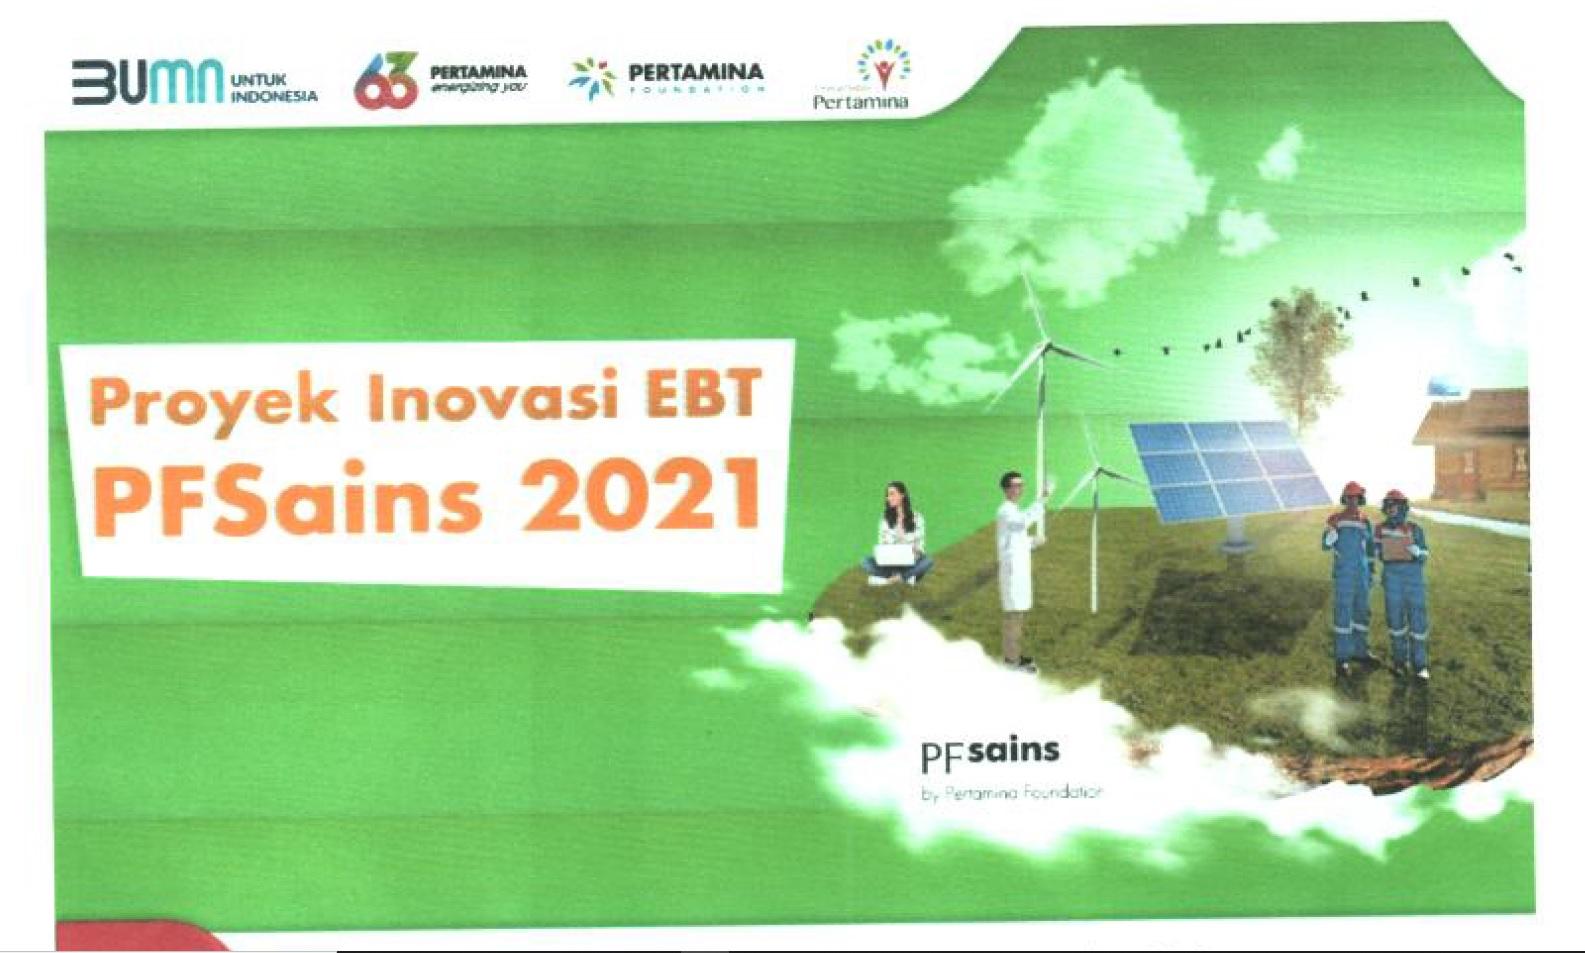 Kompetisi Inovasi EBT – PFSaint 2021 Pertamina Foundation